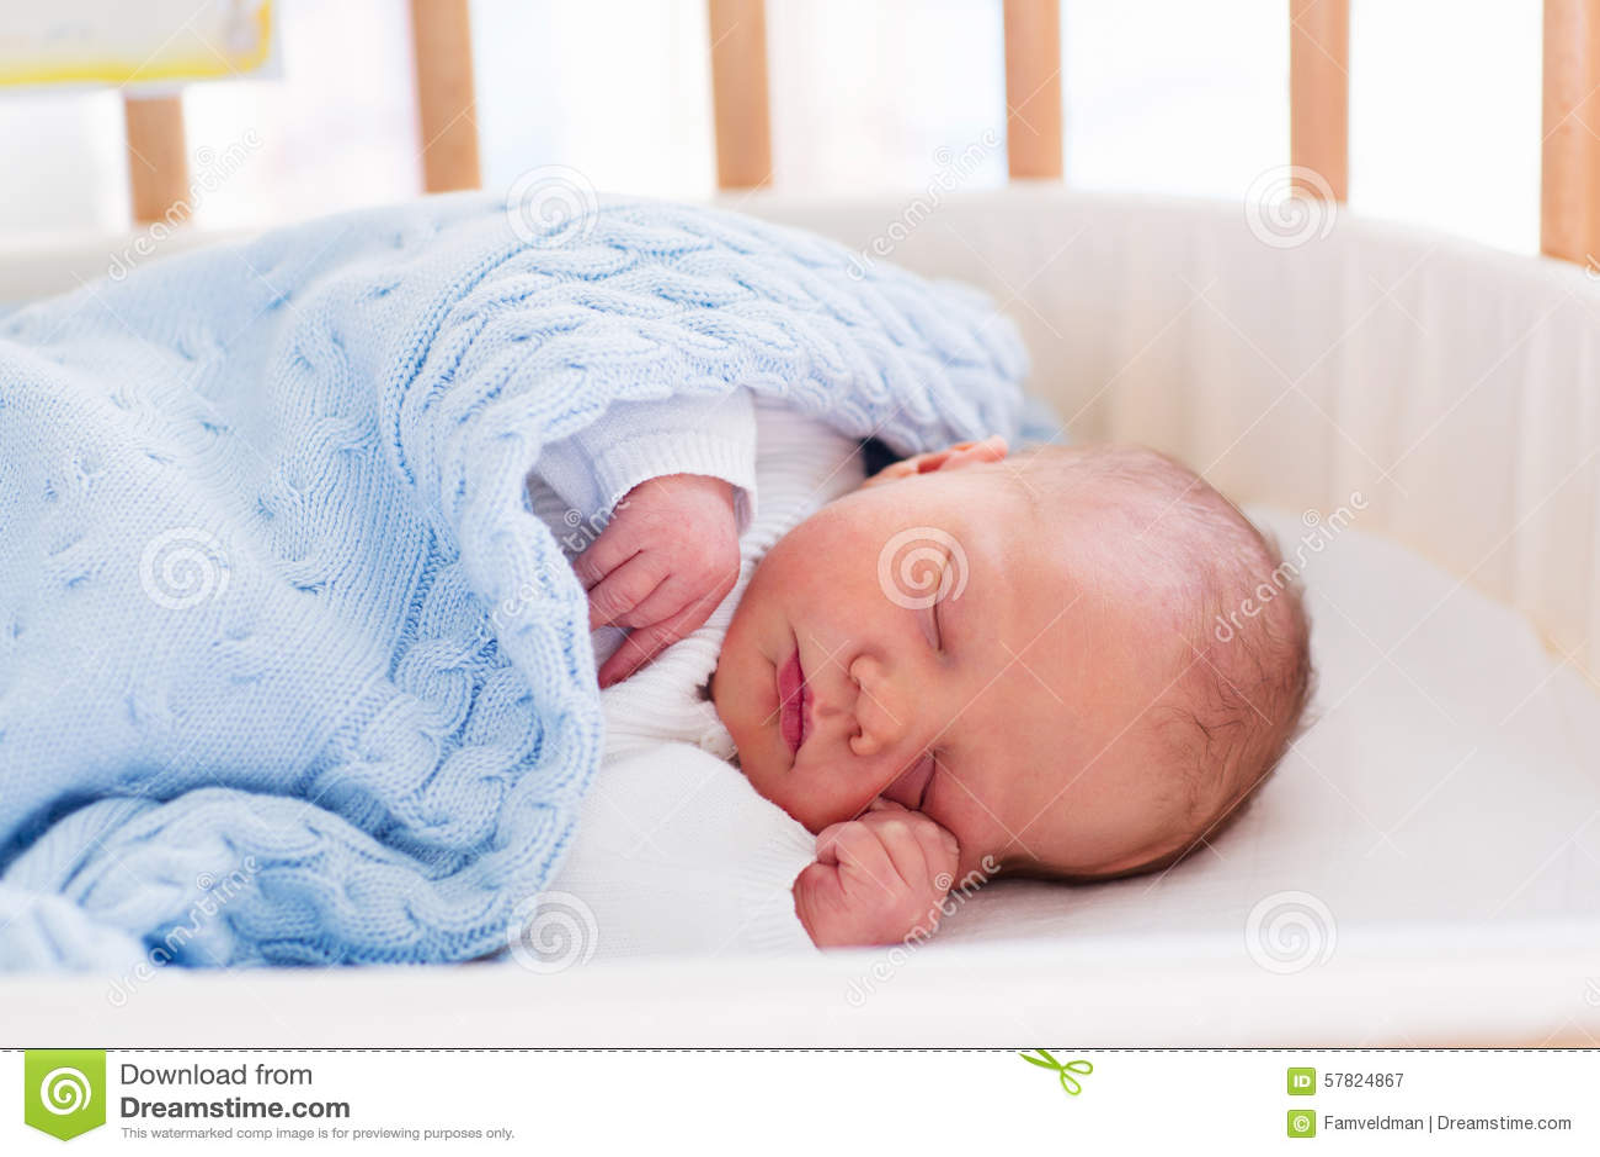 Newborn Baby Boy In Hospital Cot Stock Photo Image 57824867